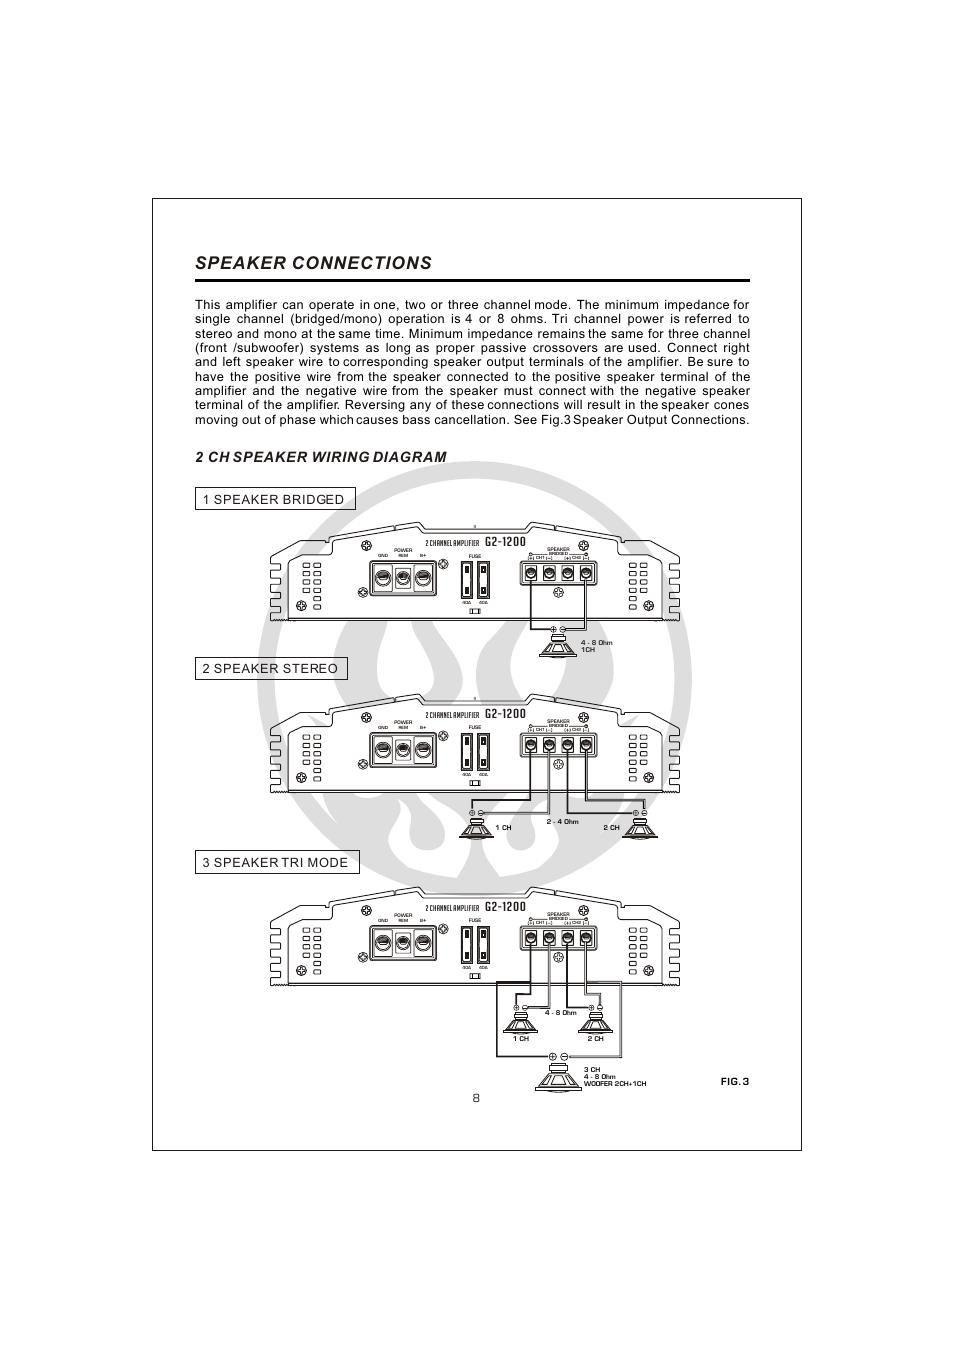 Вк 10, Speaker connections, 2 ch speaker wiring diagram | Interfire ...